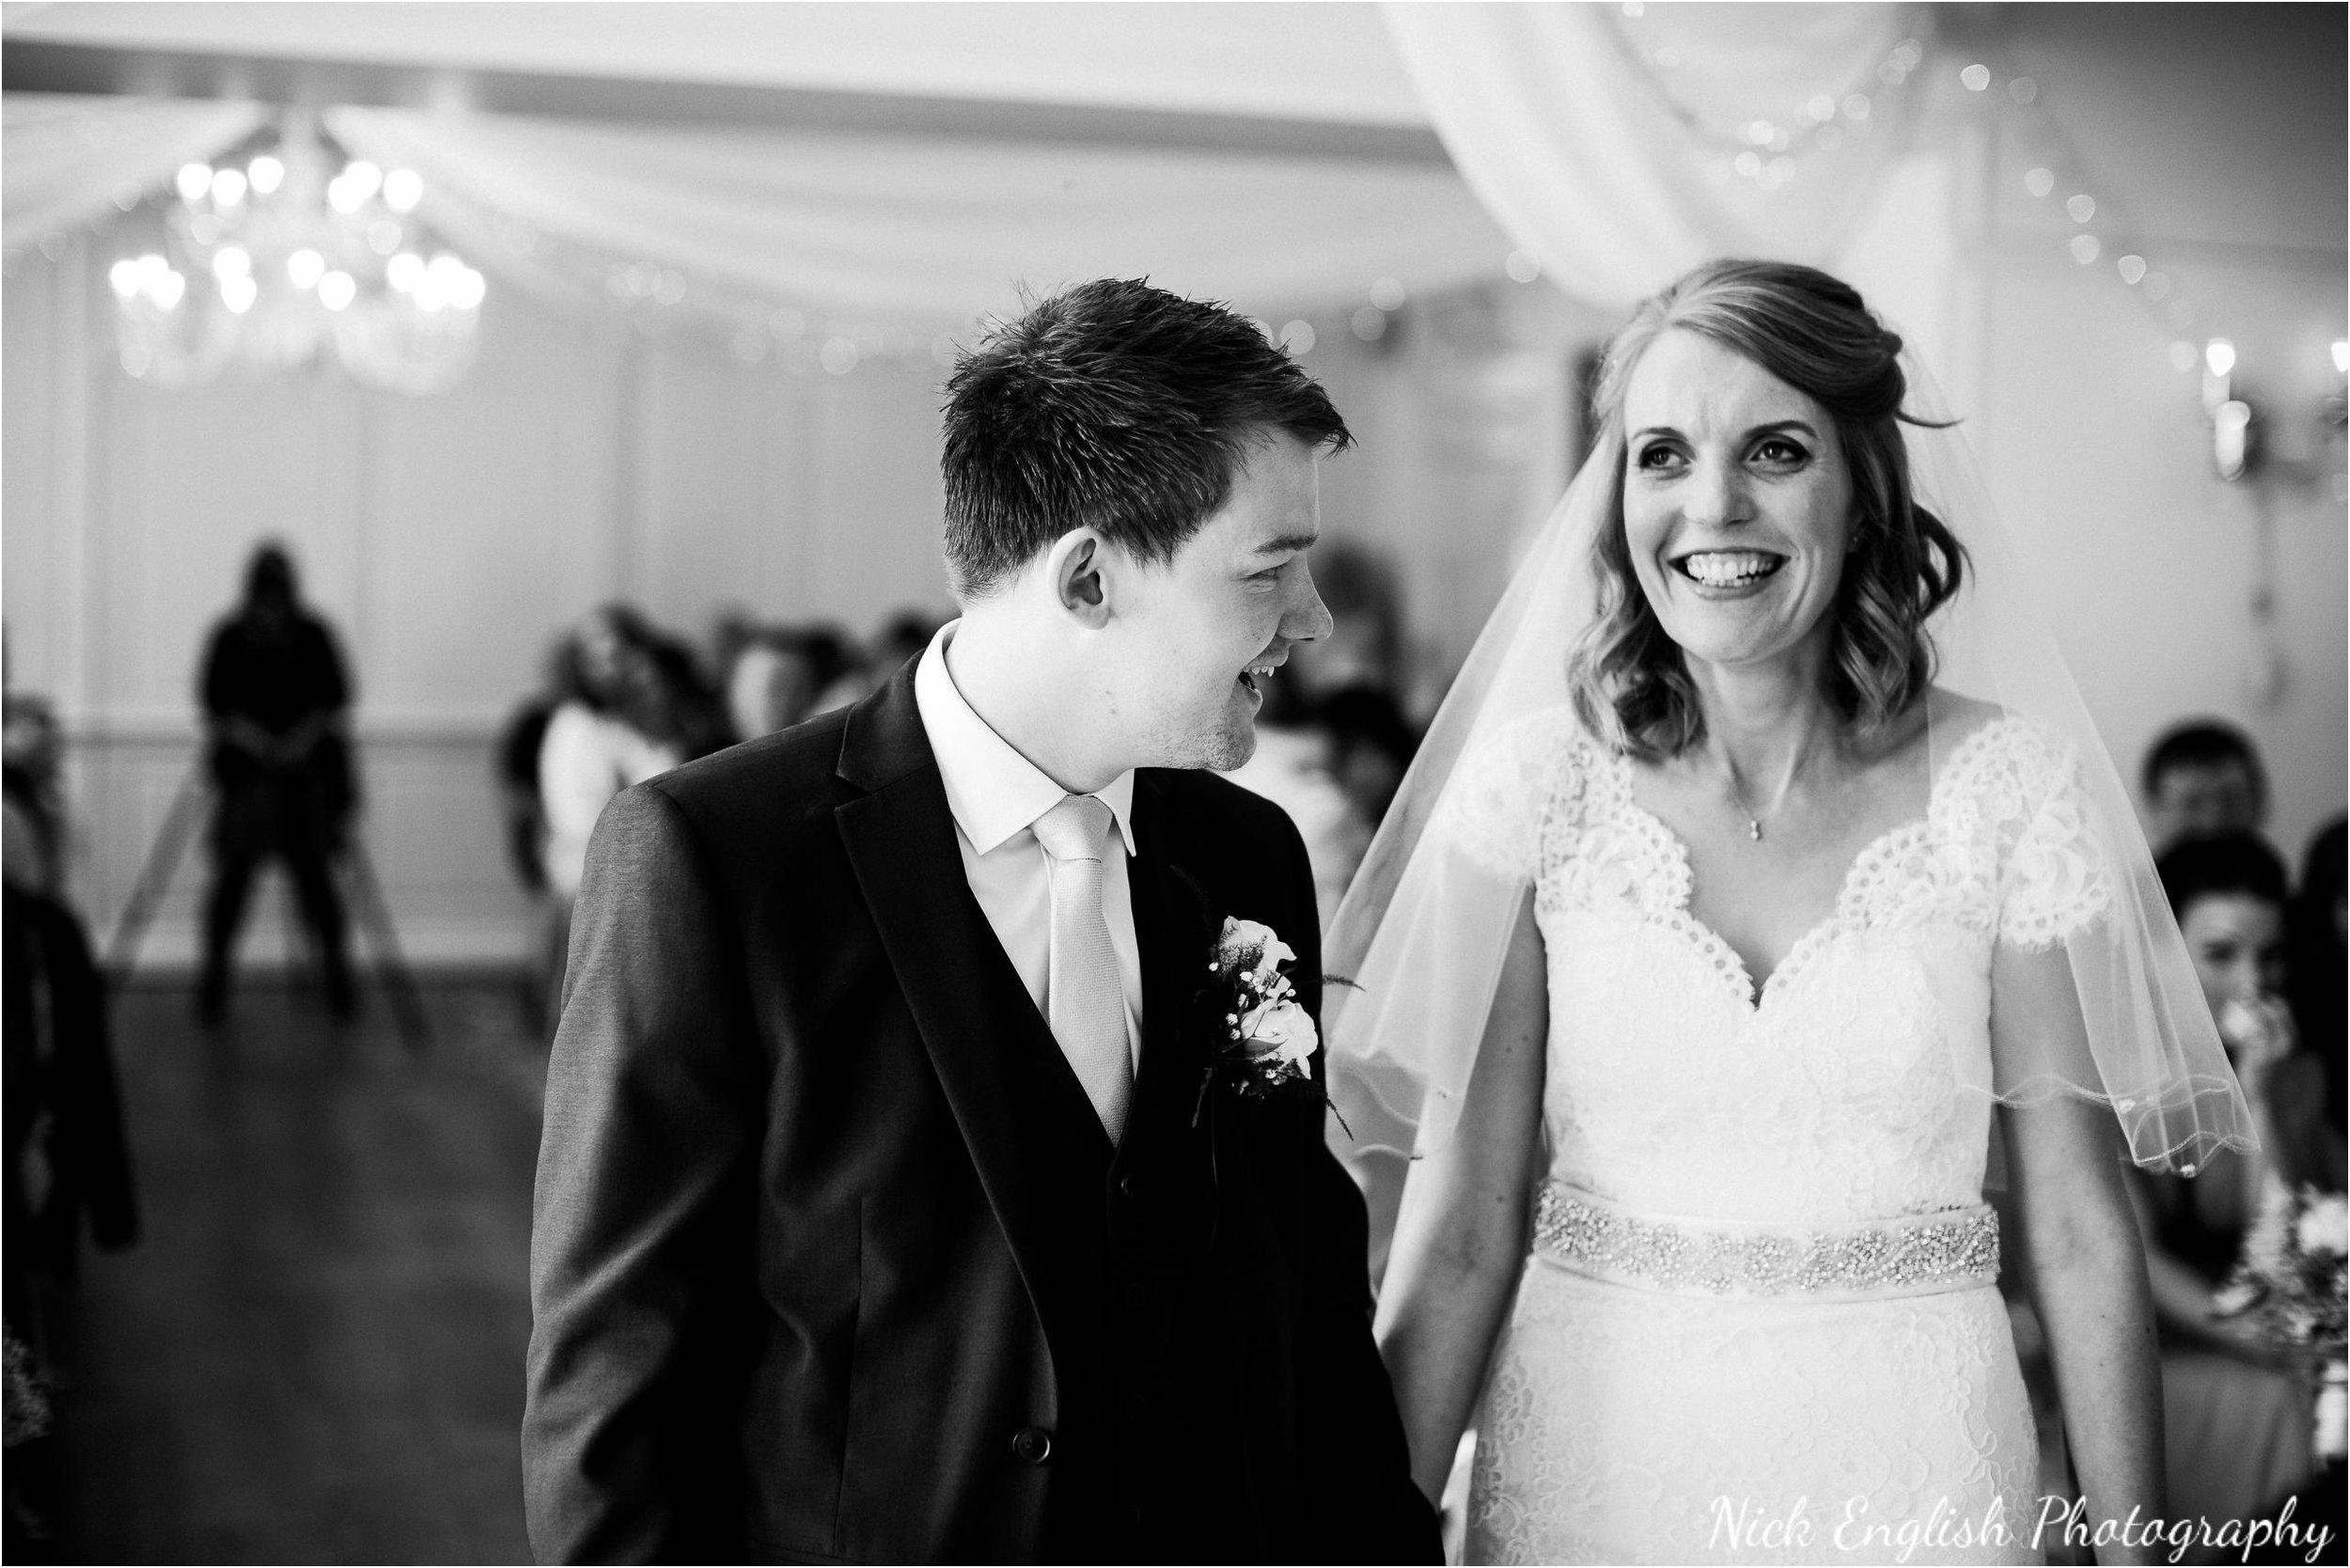 Alison James Wedding Photographs at Eaves Hall West Bradford 95jpg.jpeg